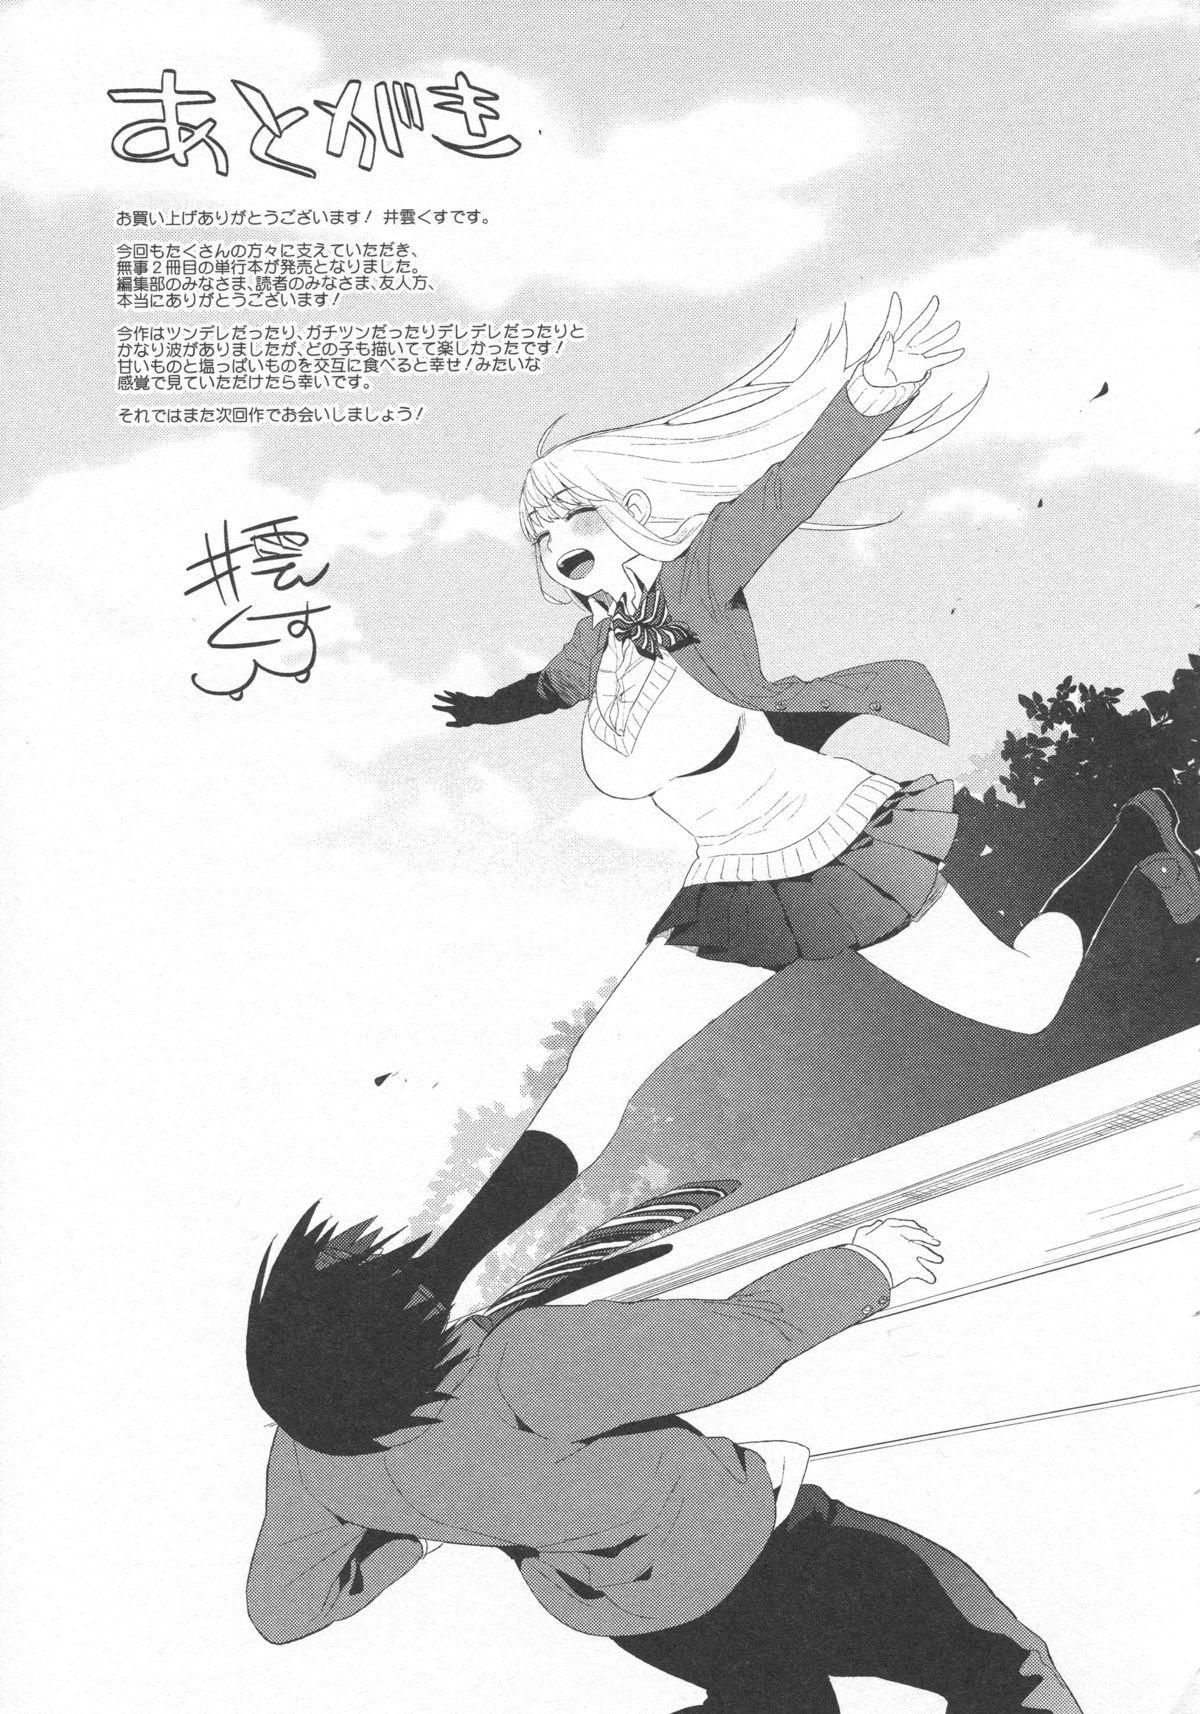 Boku Dake no Yuuyami - Only My Twilight 203